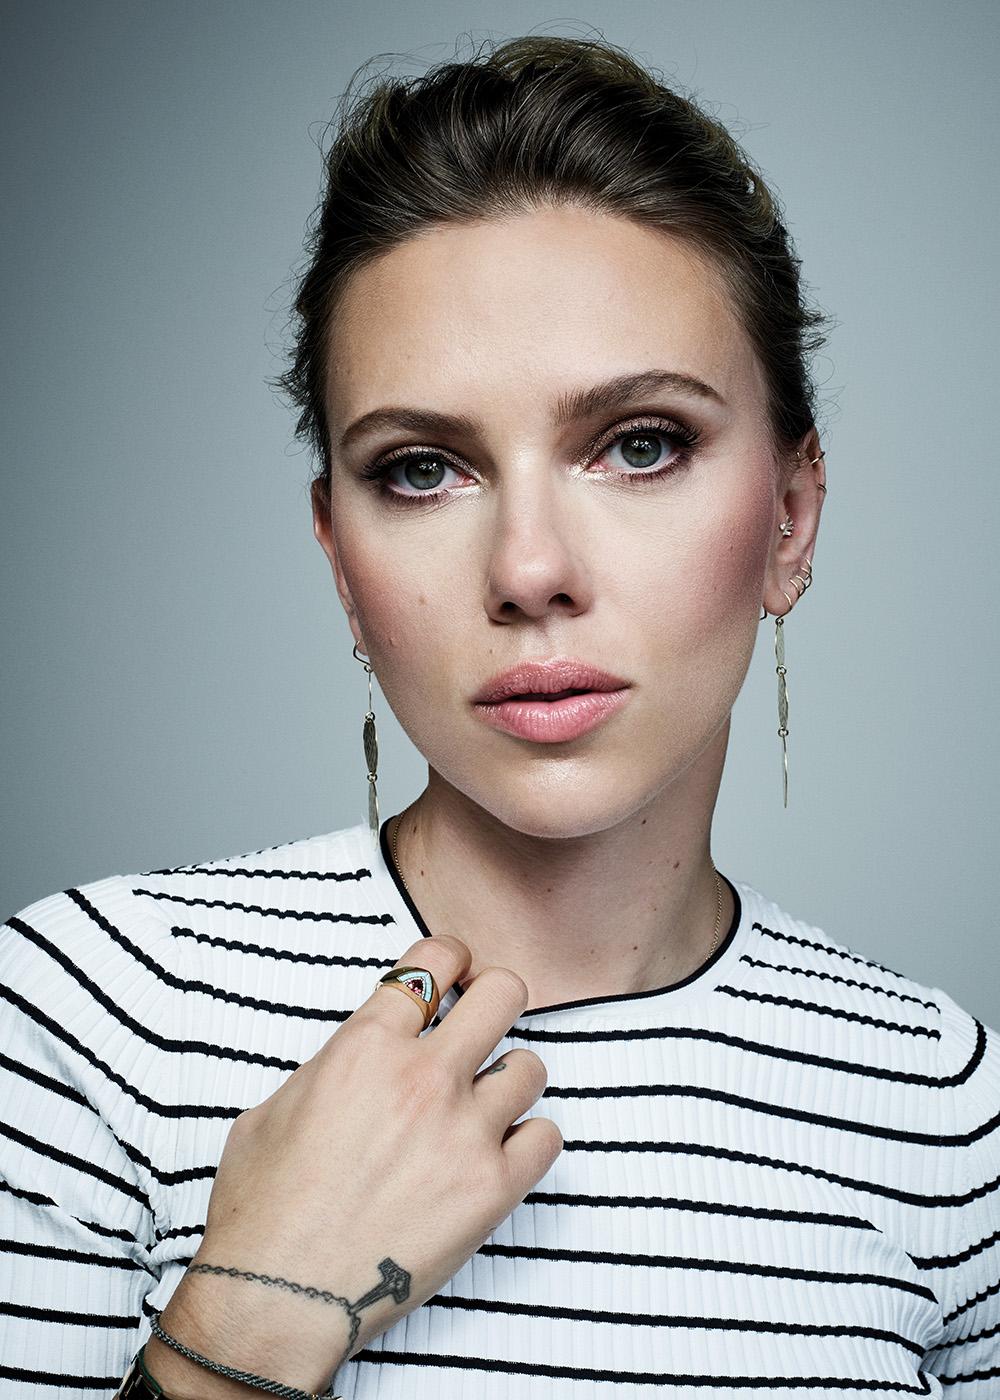 Scarlett Johansson Actors on Actors